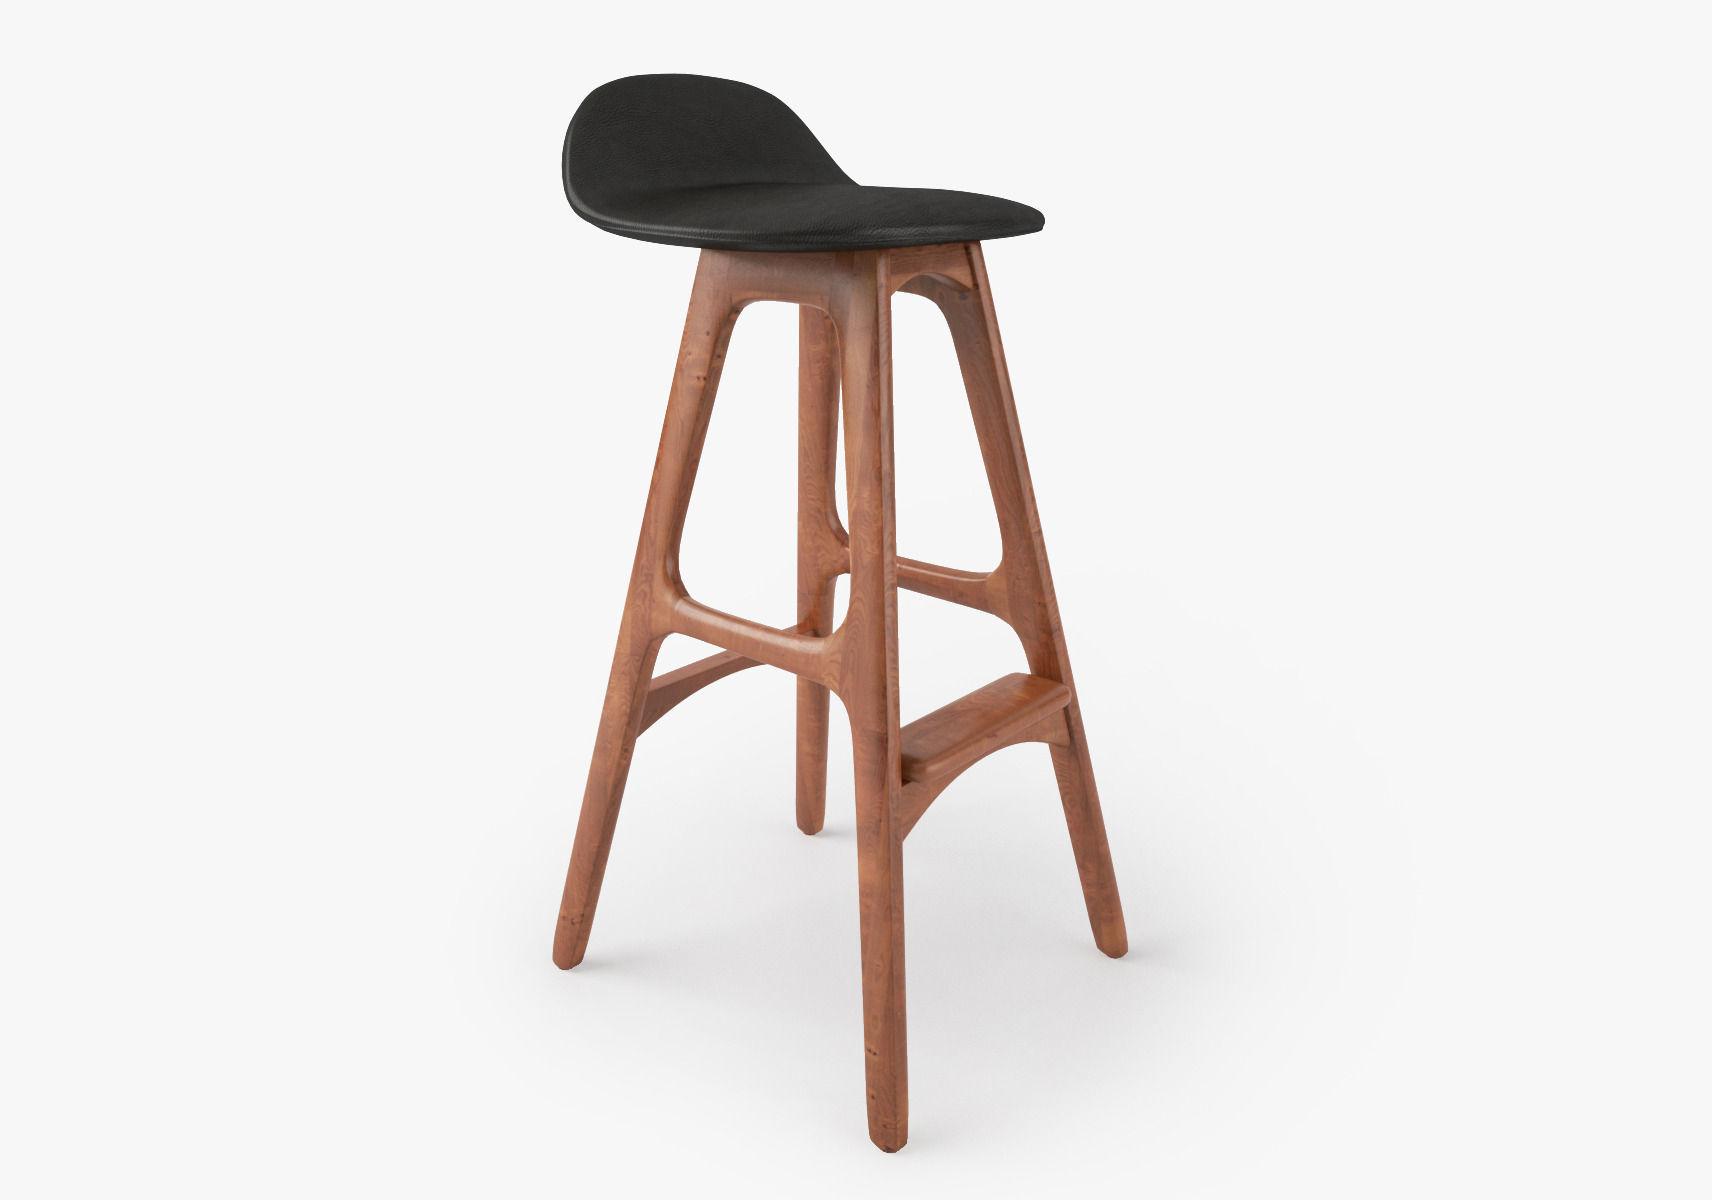 Strange Erik Buch Bar Stool 3D Model Machost Co Dining Chair Design Ideas Machostcouk